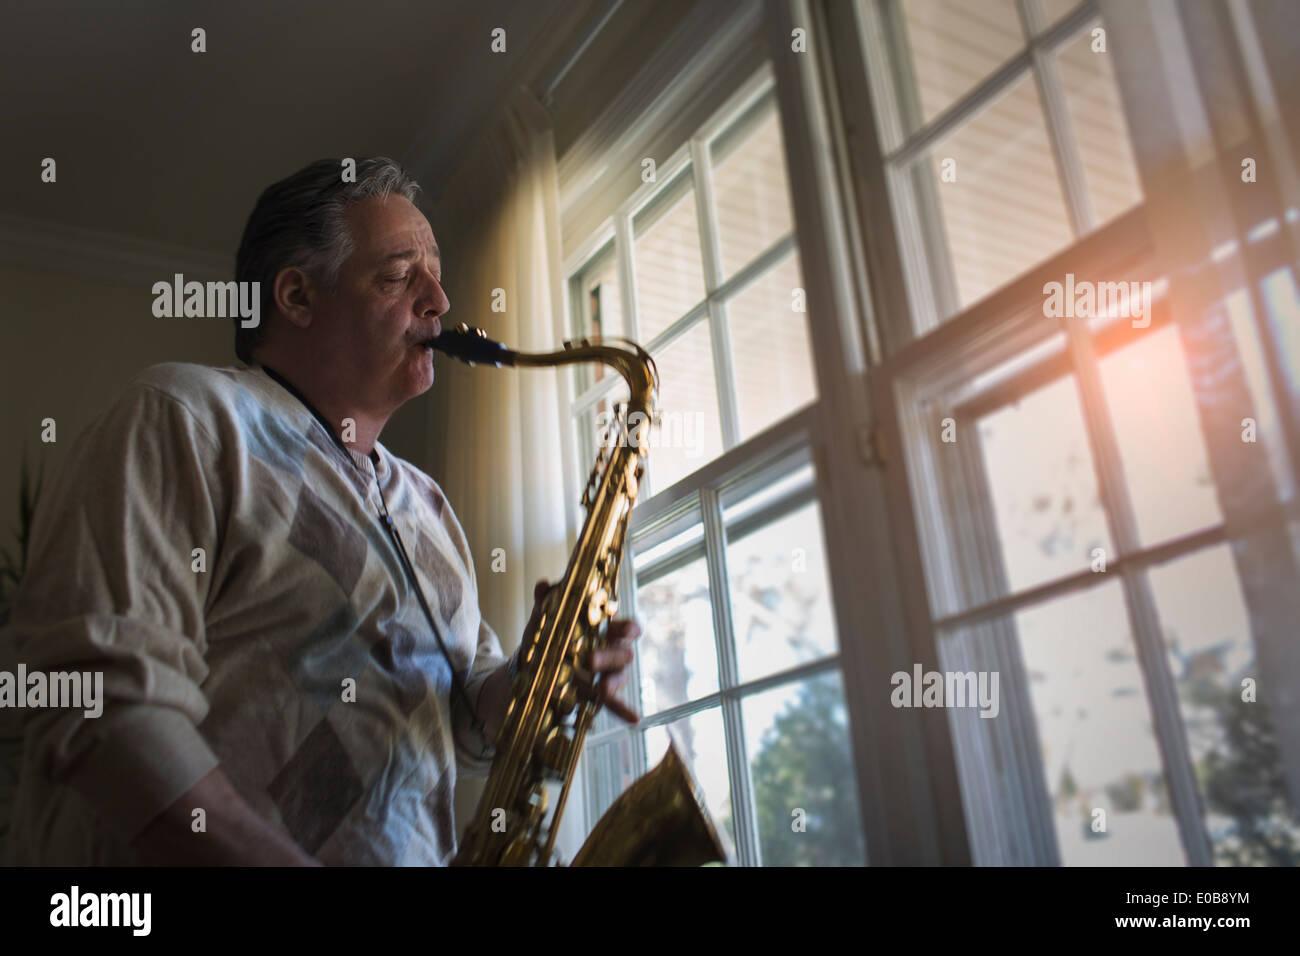 Mature man at home playing saxophone - Stock Image